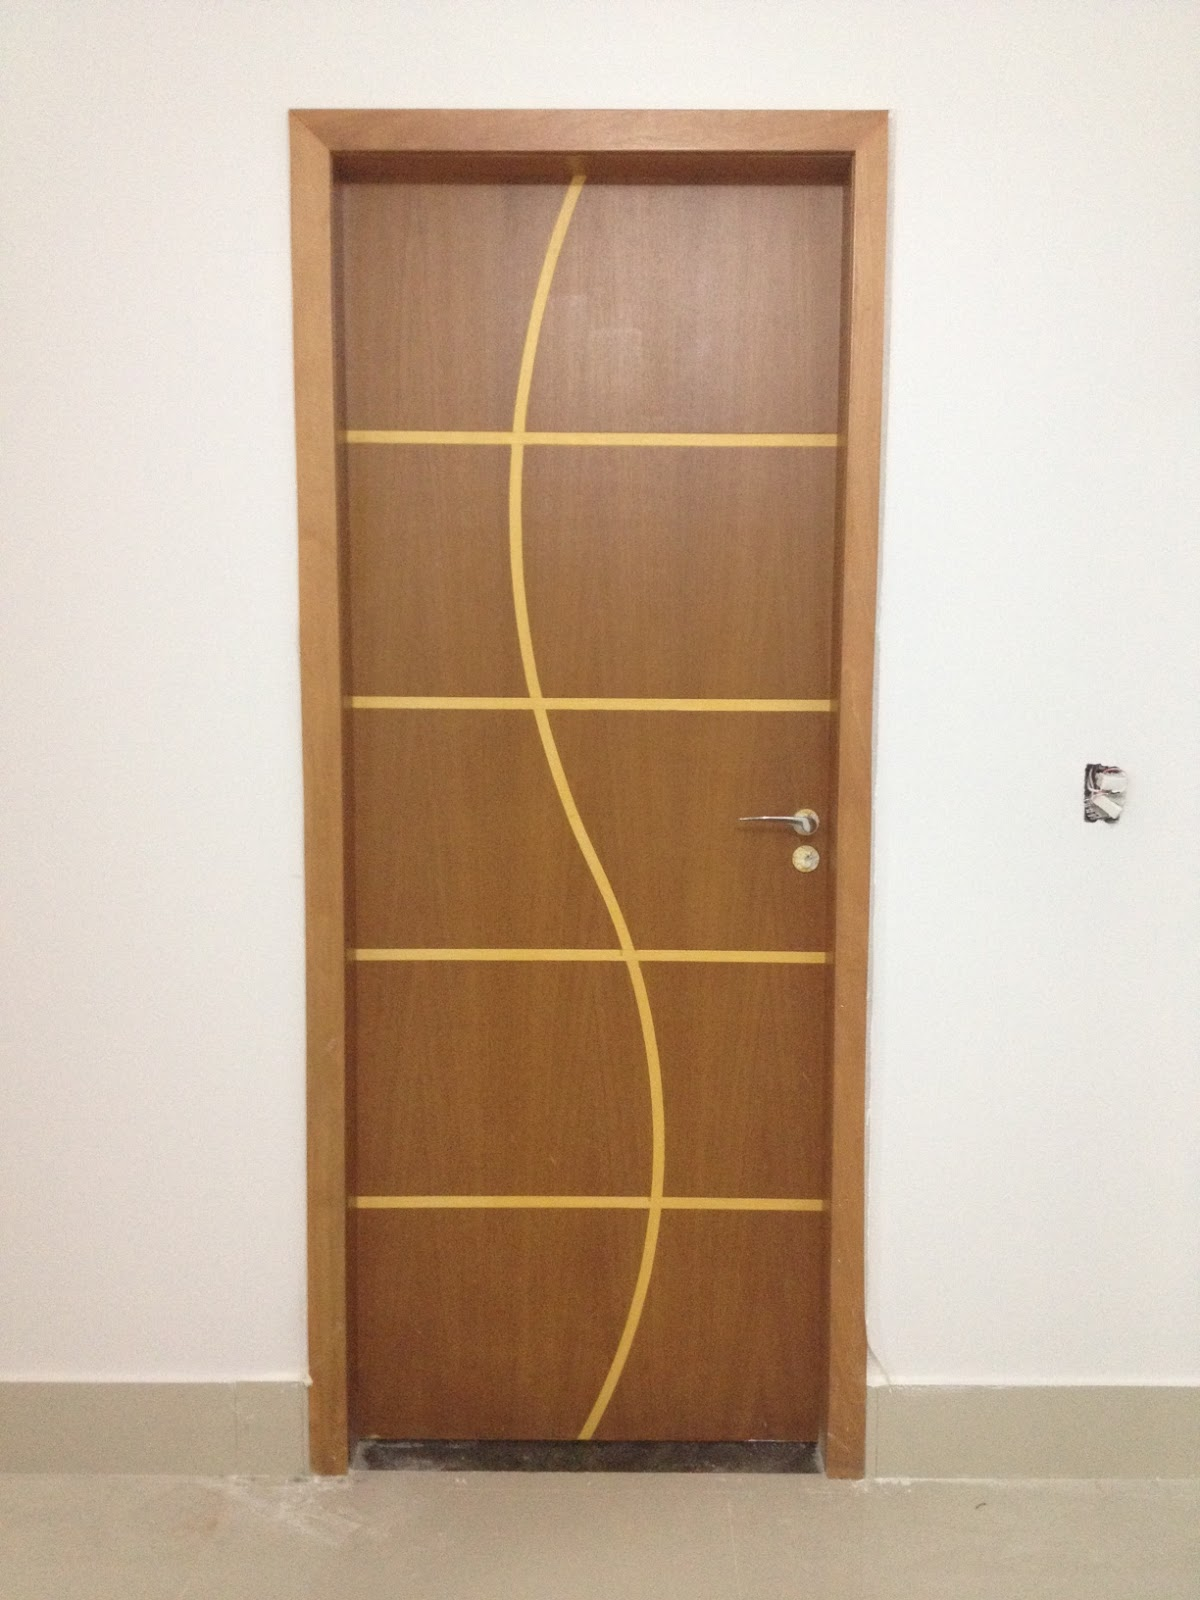 #A87D23 Imagens de 19 modelos de portas externas e internas casa 1040 Portas E Janelas De Aluminio Cor Madeira